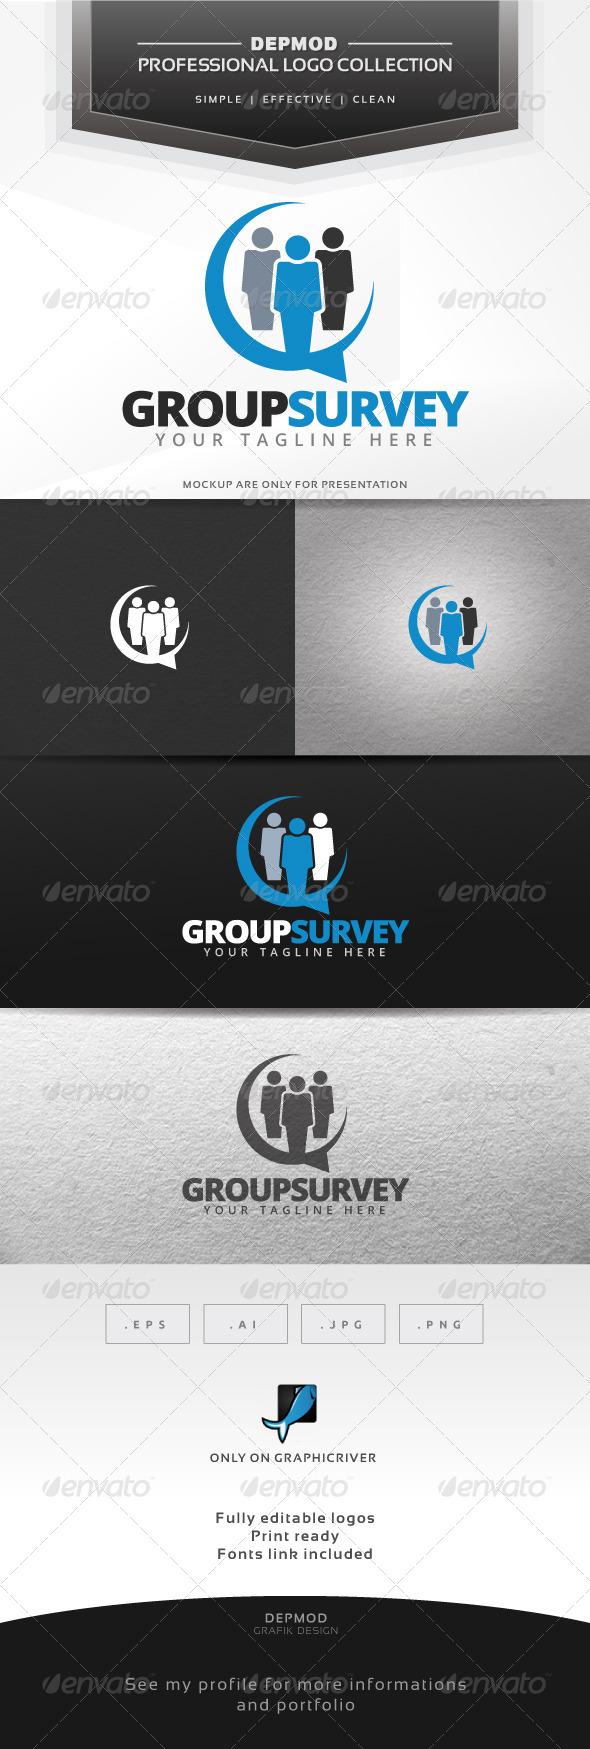 Group Survey Logo